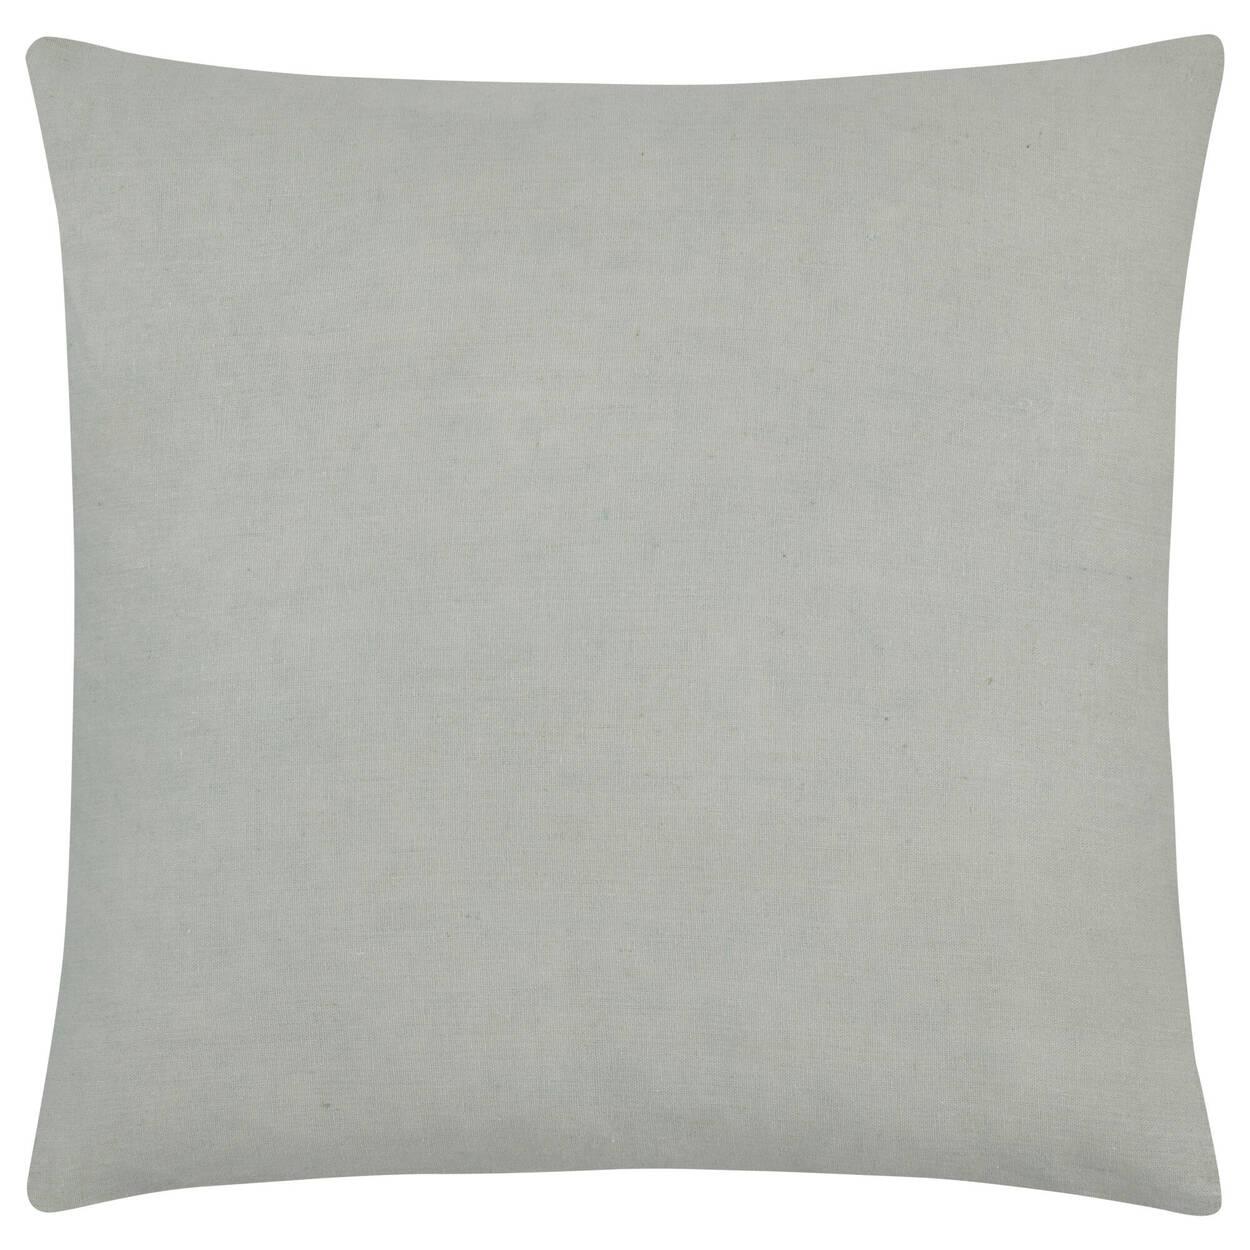 "Seda Decorative Pillow 19"" x 19"""